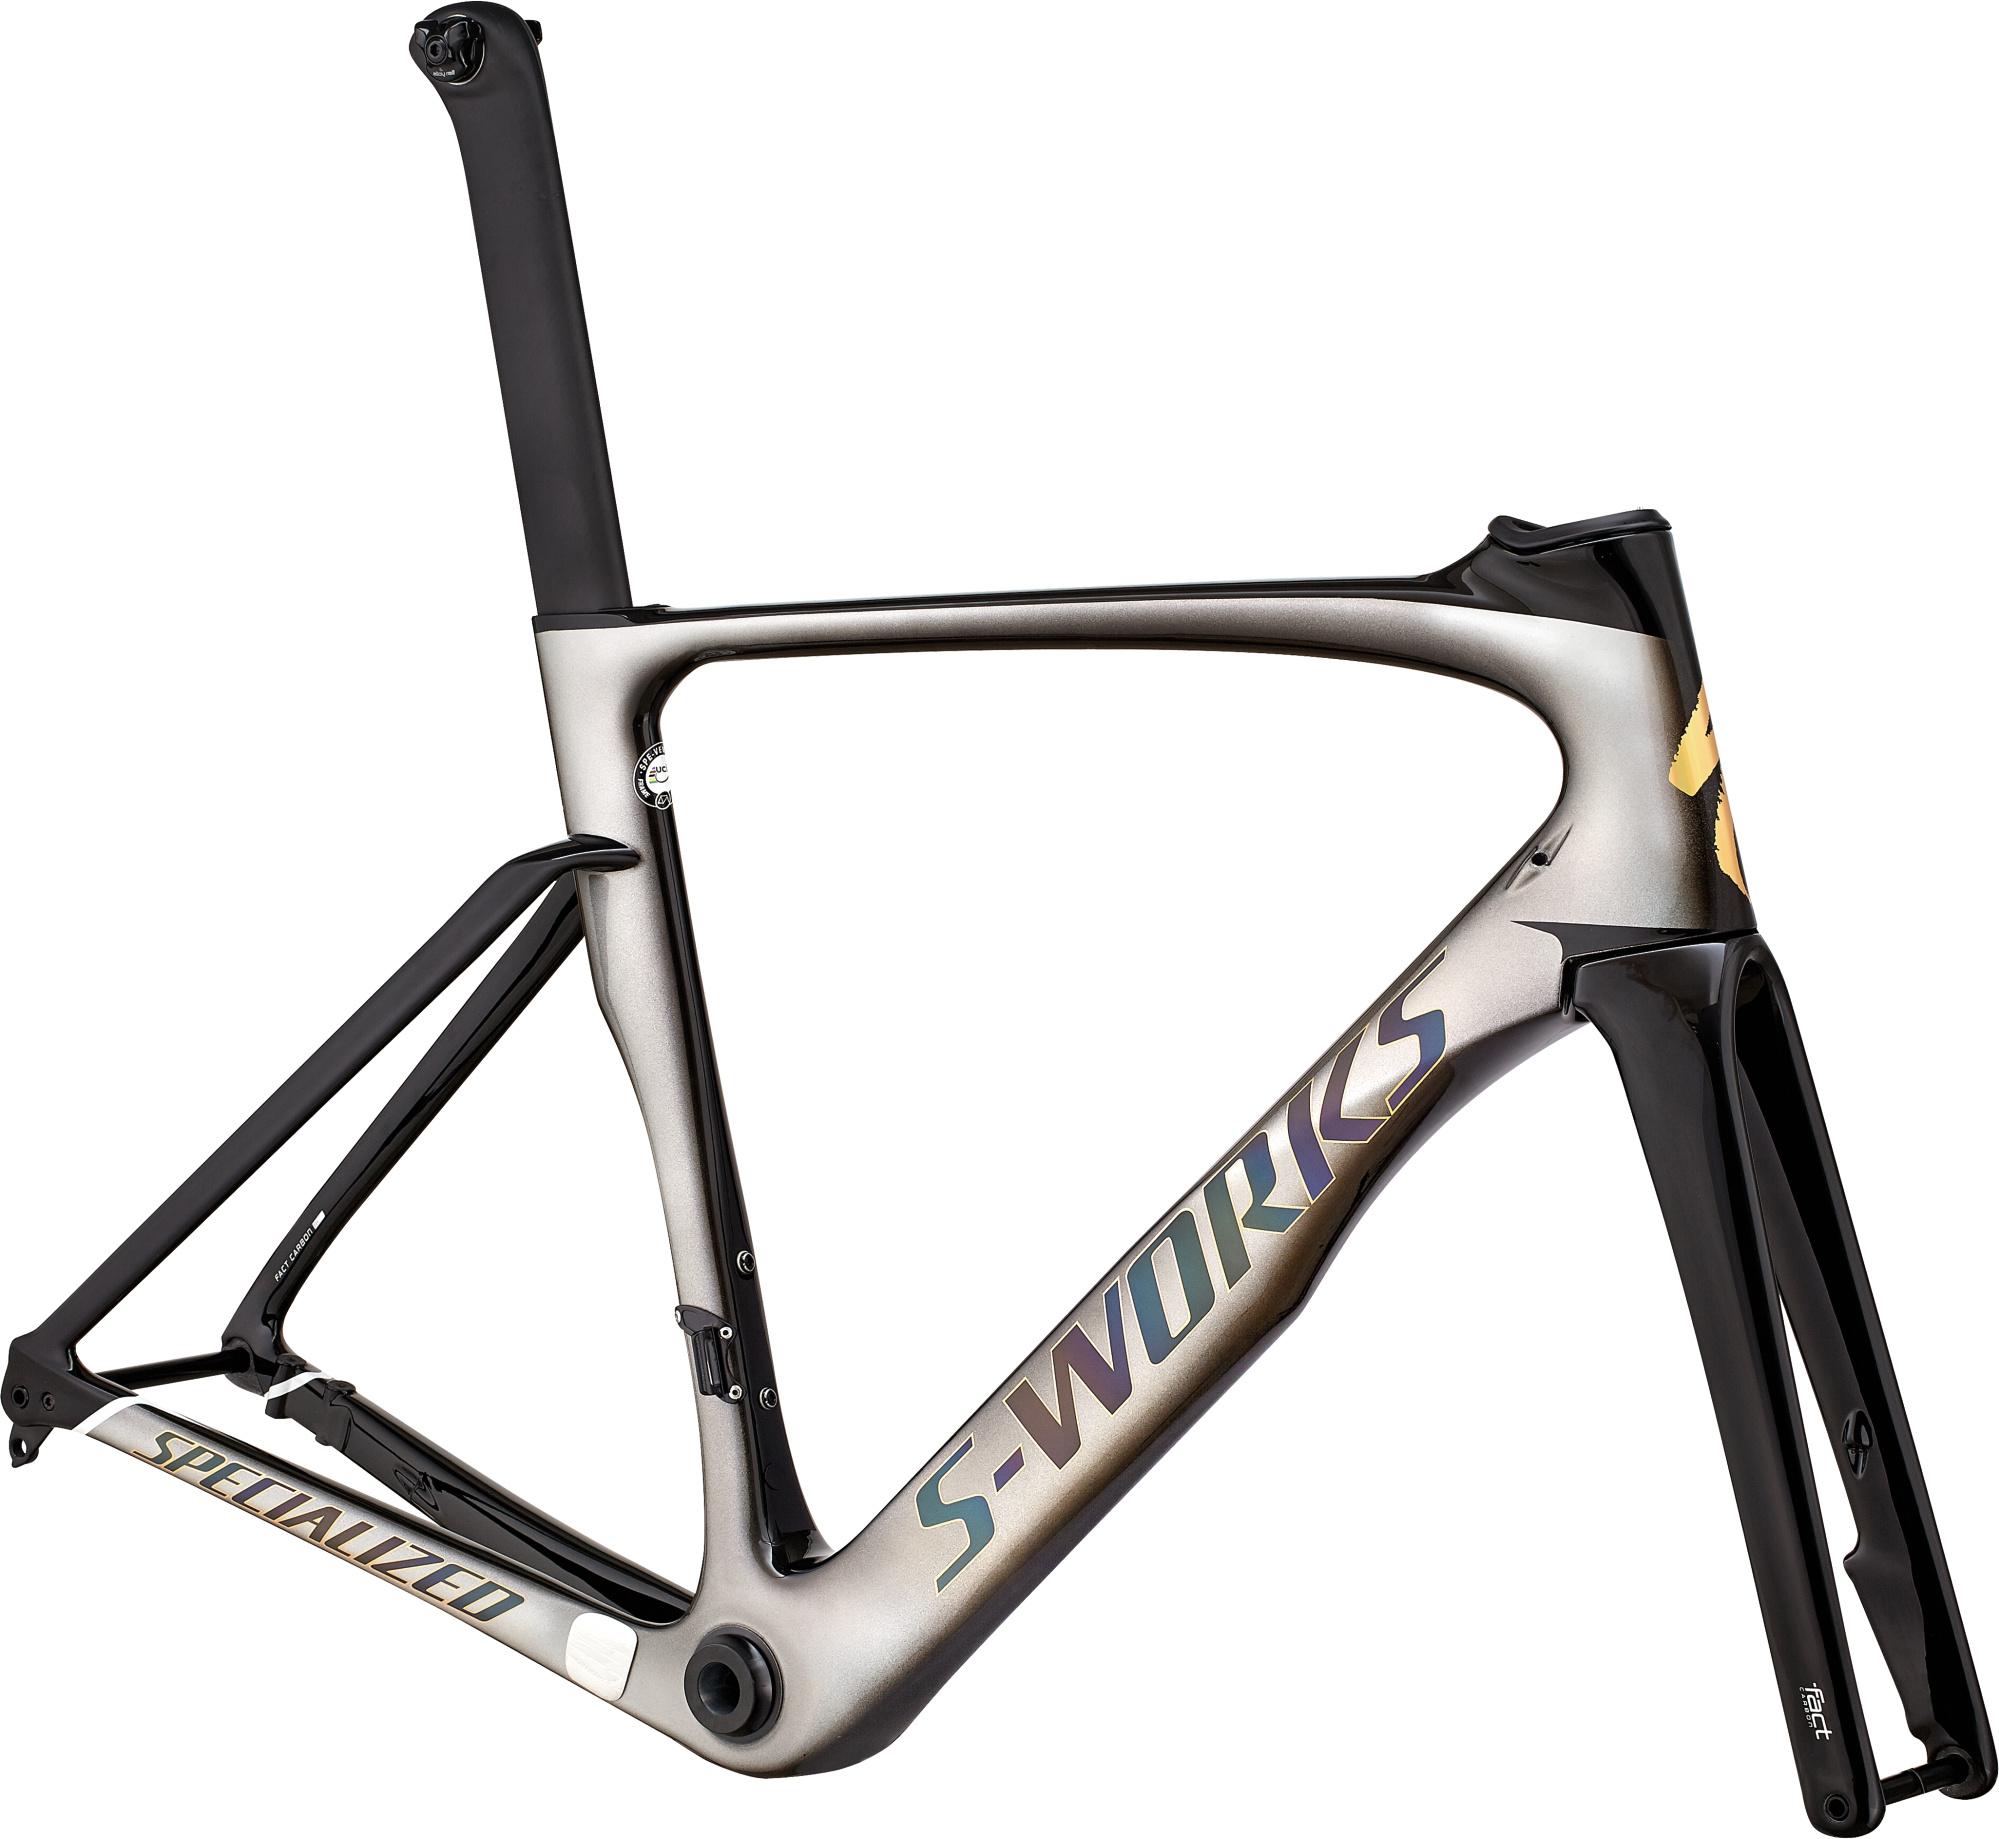 http://cycleshop-fun.com/images/77818-00_VENGE_SW-DISC-VIAS-FRMSET_SAGAN-SUPERSTAR_HERO.jpg